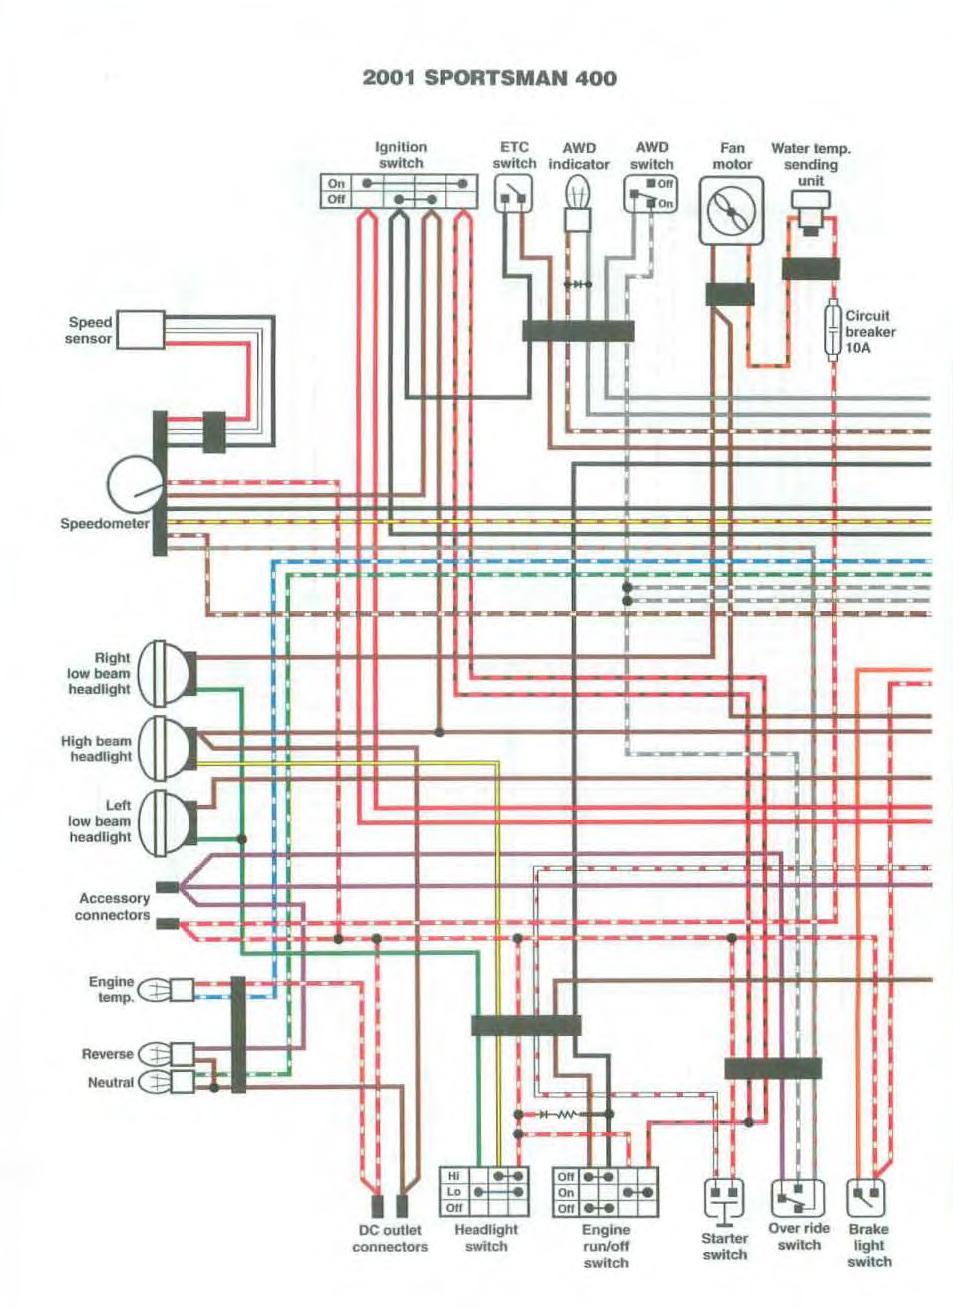 Read WIRING 2008 Polaris 500 Wiring Diagram FULL Version HD Quality Wiring  Diagram - SCHEMAEUROPA.ITISRIGHI.IT schemaeuropa itisrighi it